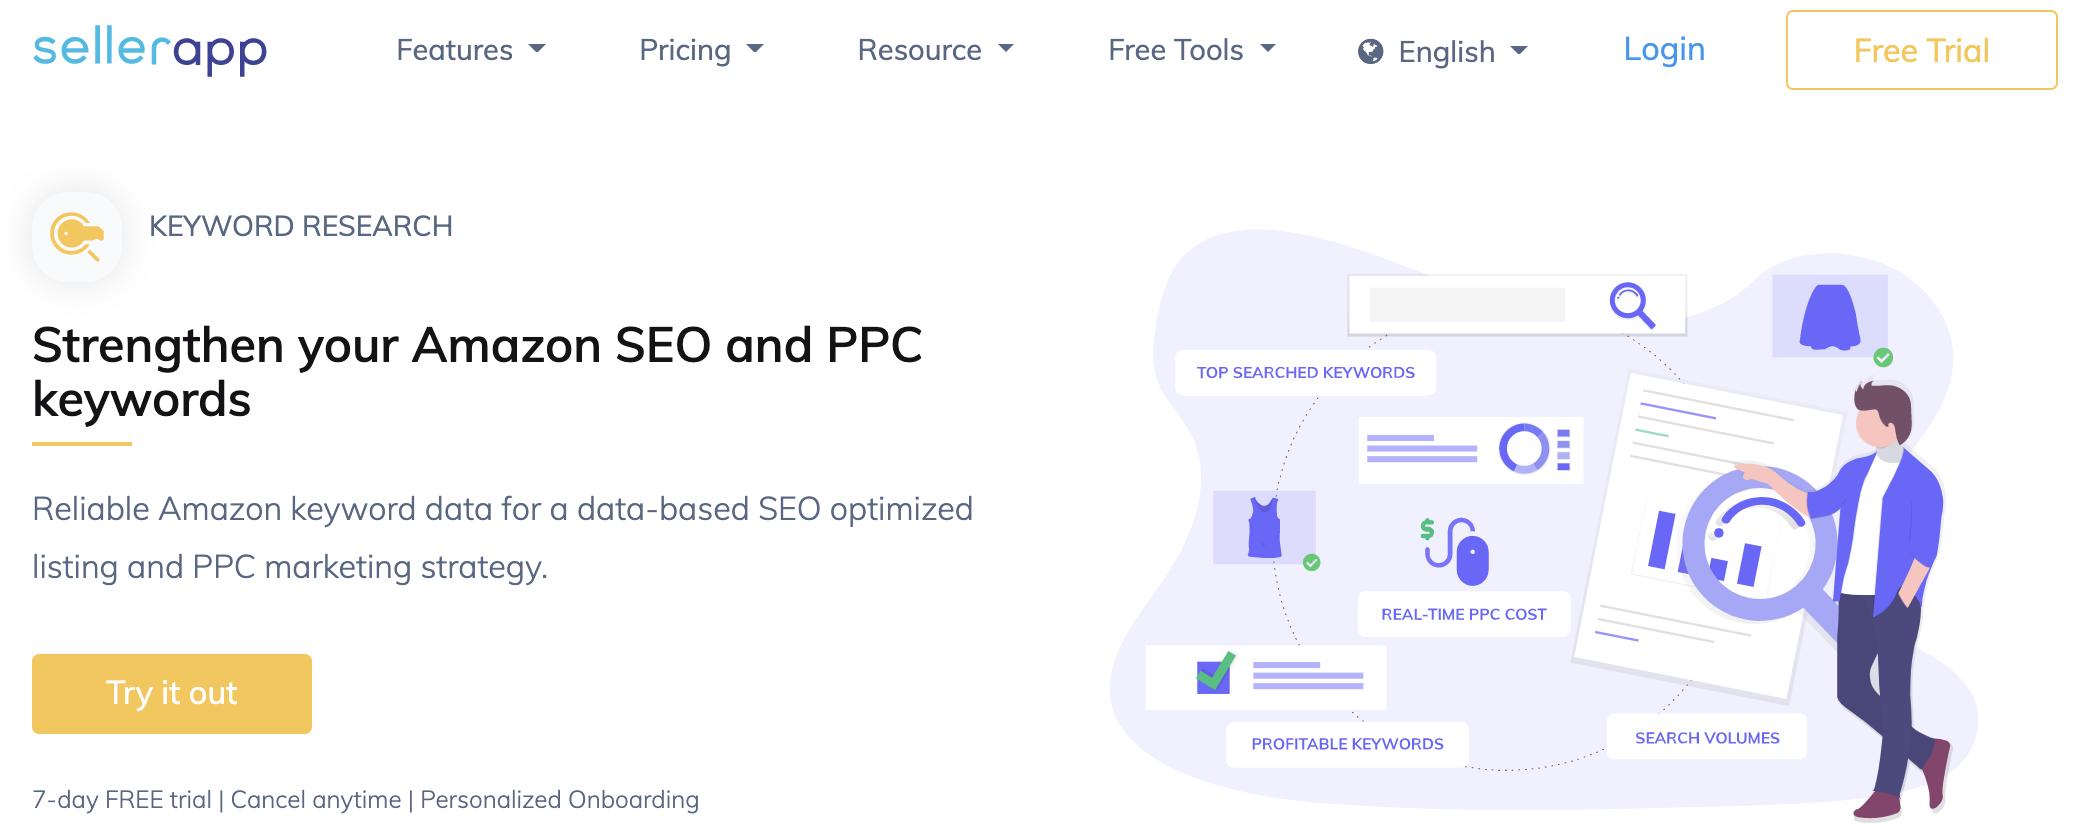 SellerApp, one of the best Amazon PPC tools